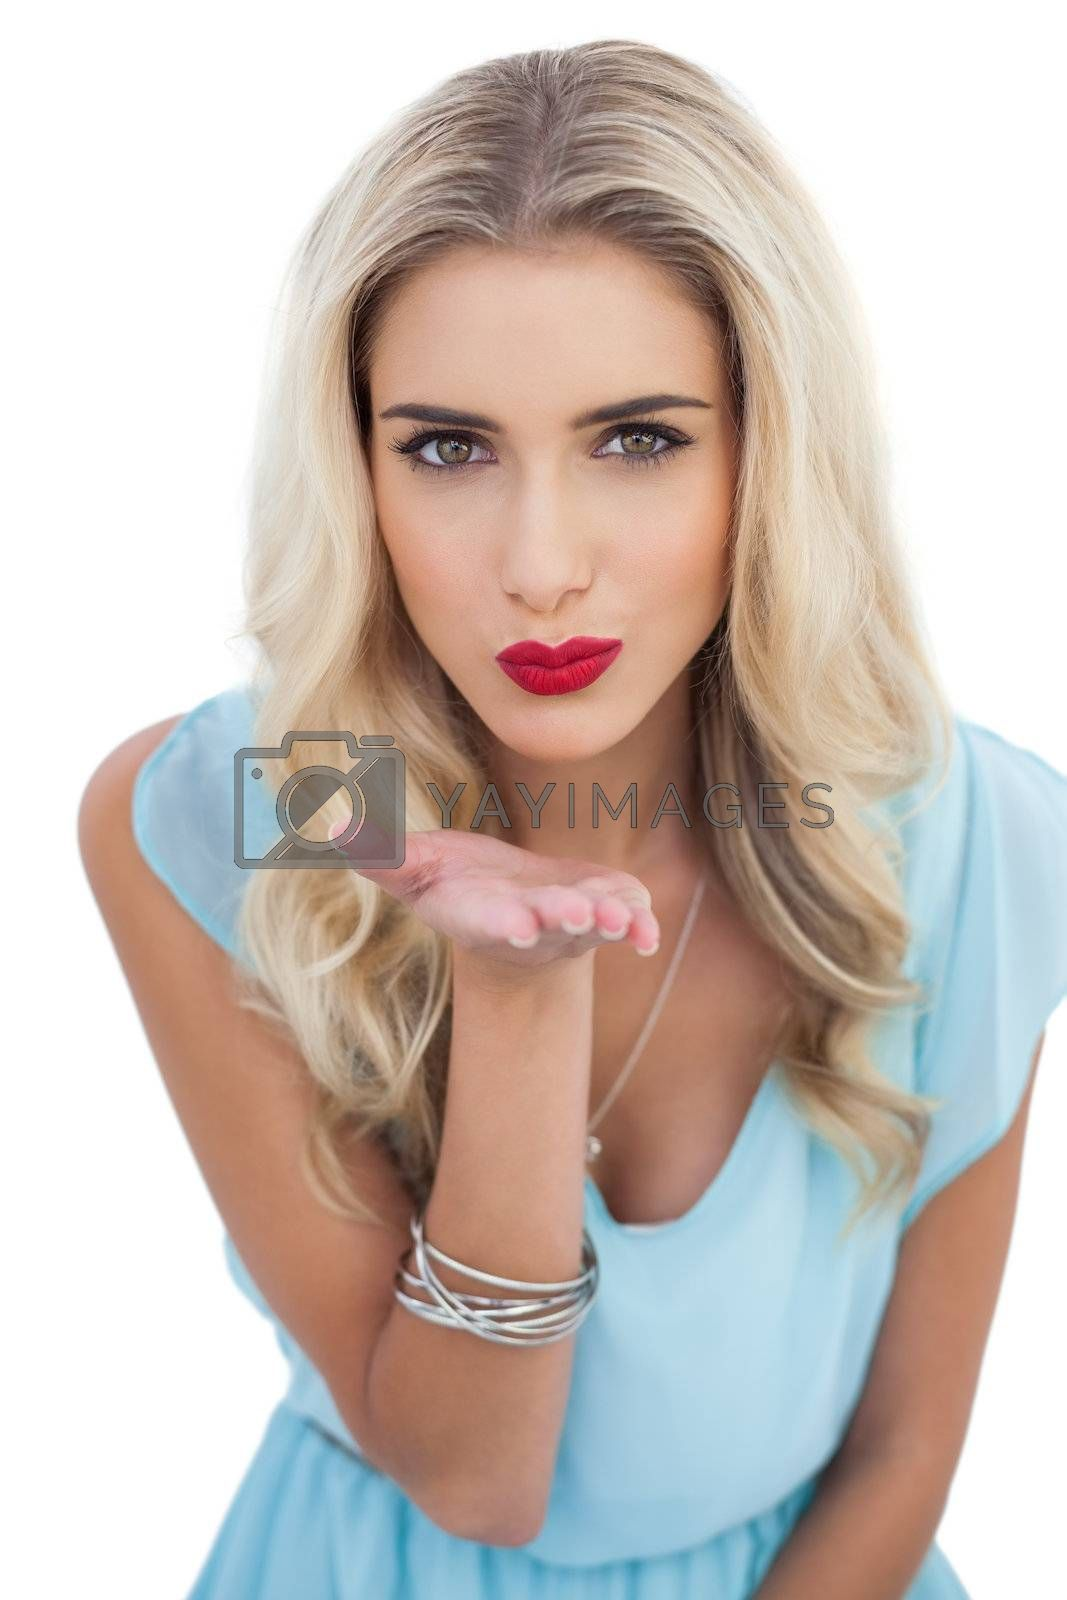 Seductive blonde model in blue dress sending a kiss to the camera by Wavebreakmedia